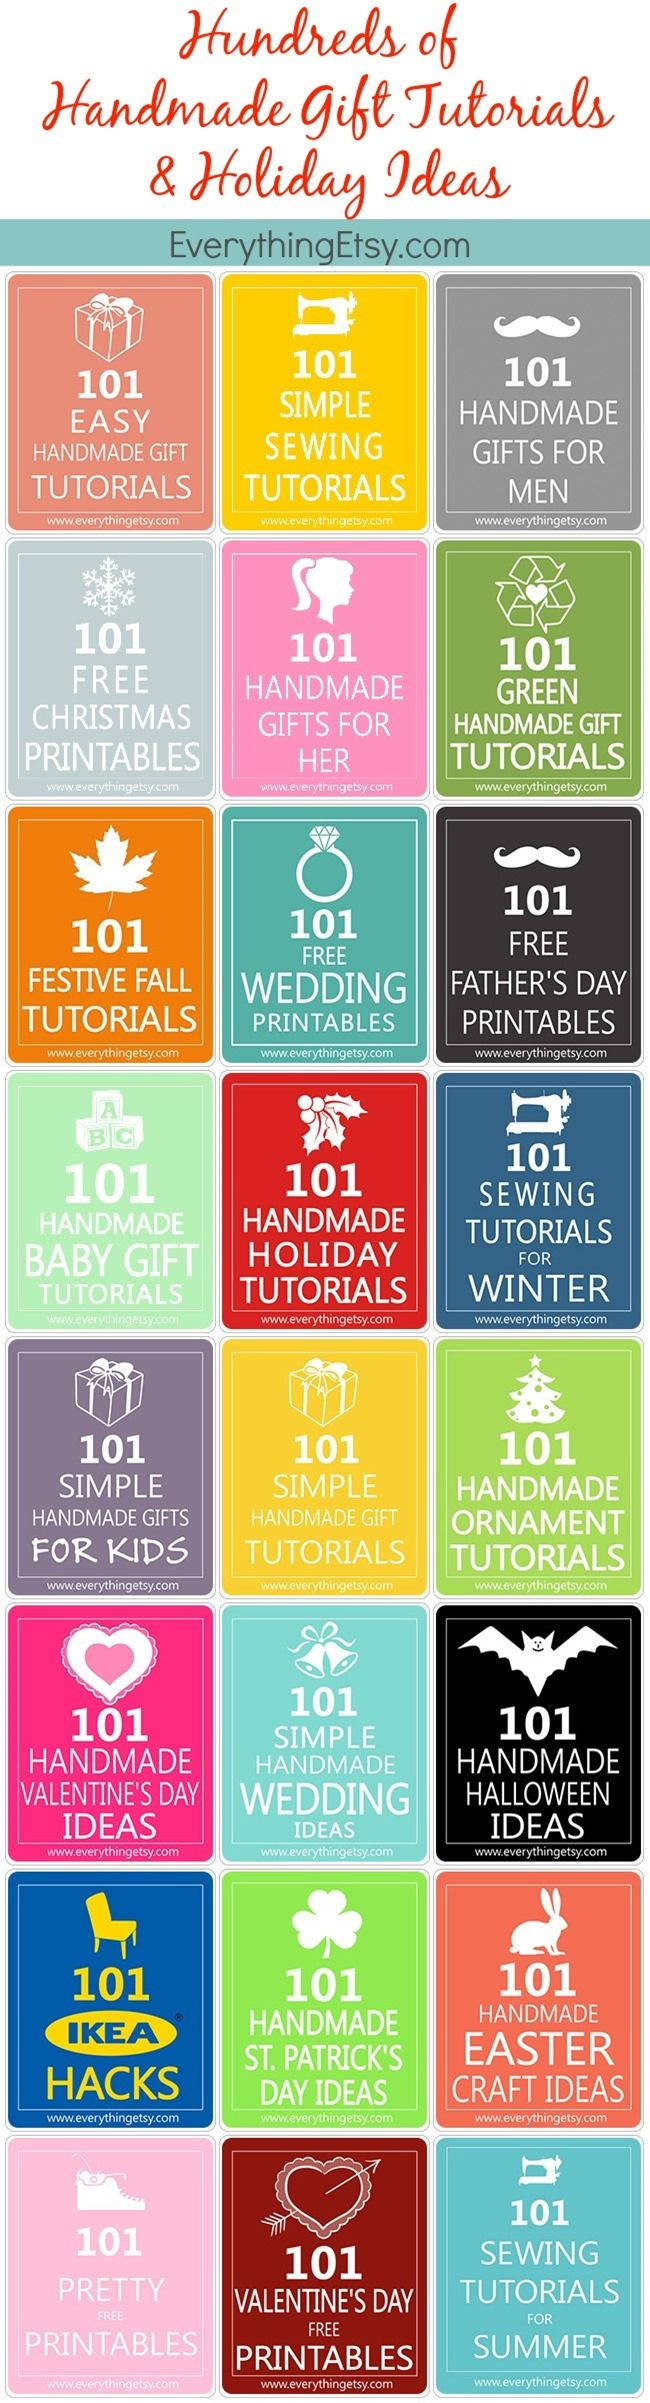 Handmade Gifts Tutorials & Holiday Ideas…Hundreds of Them!